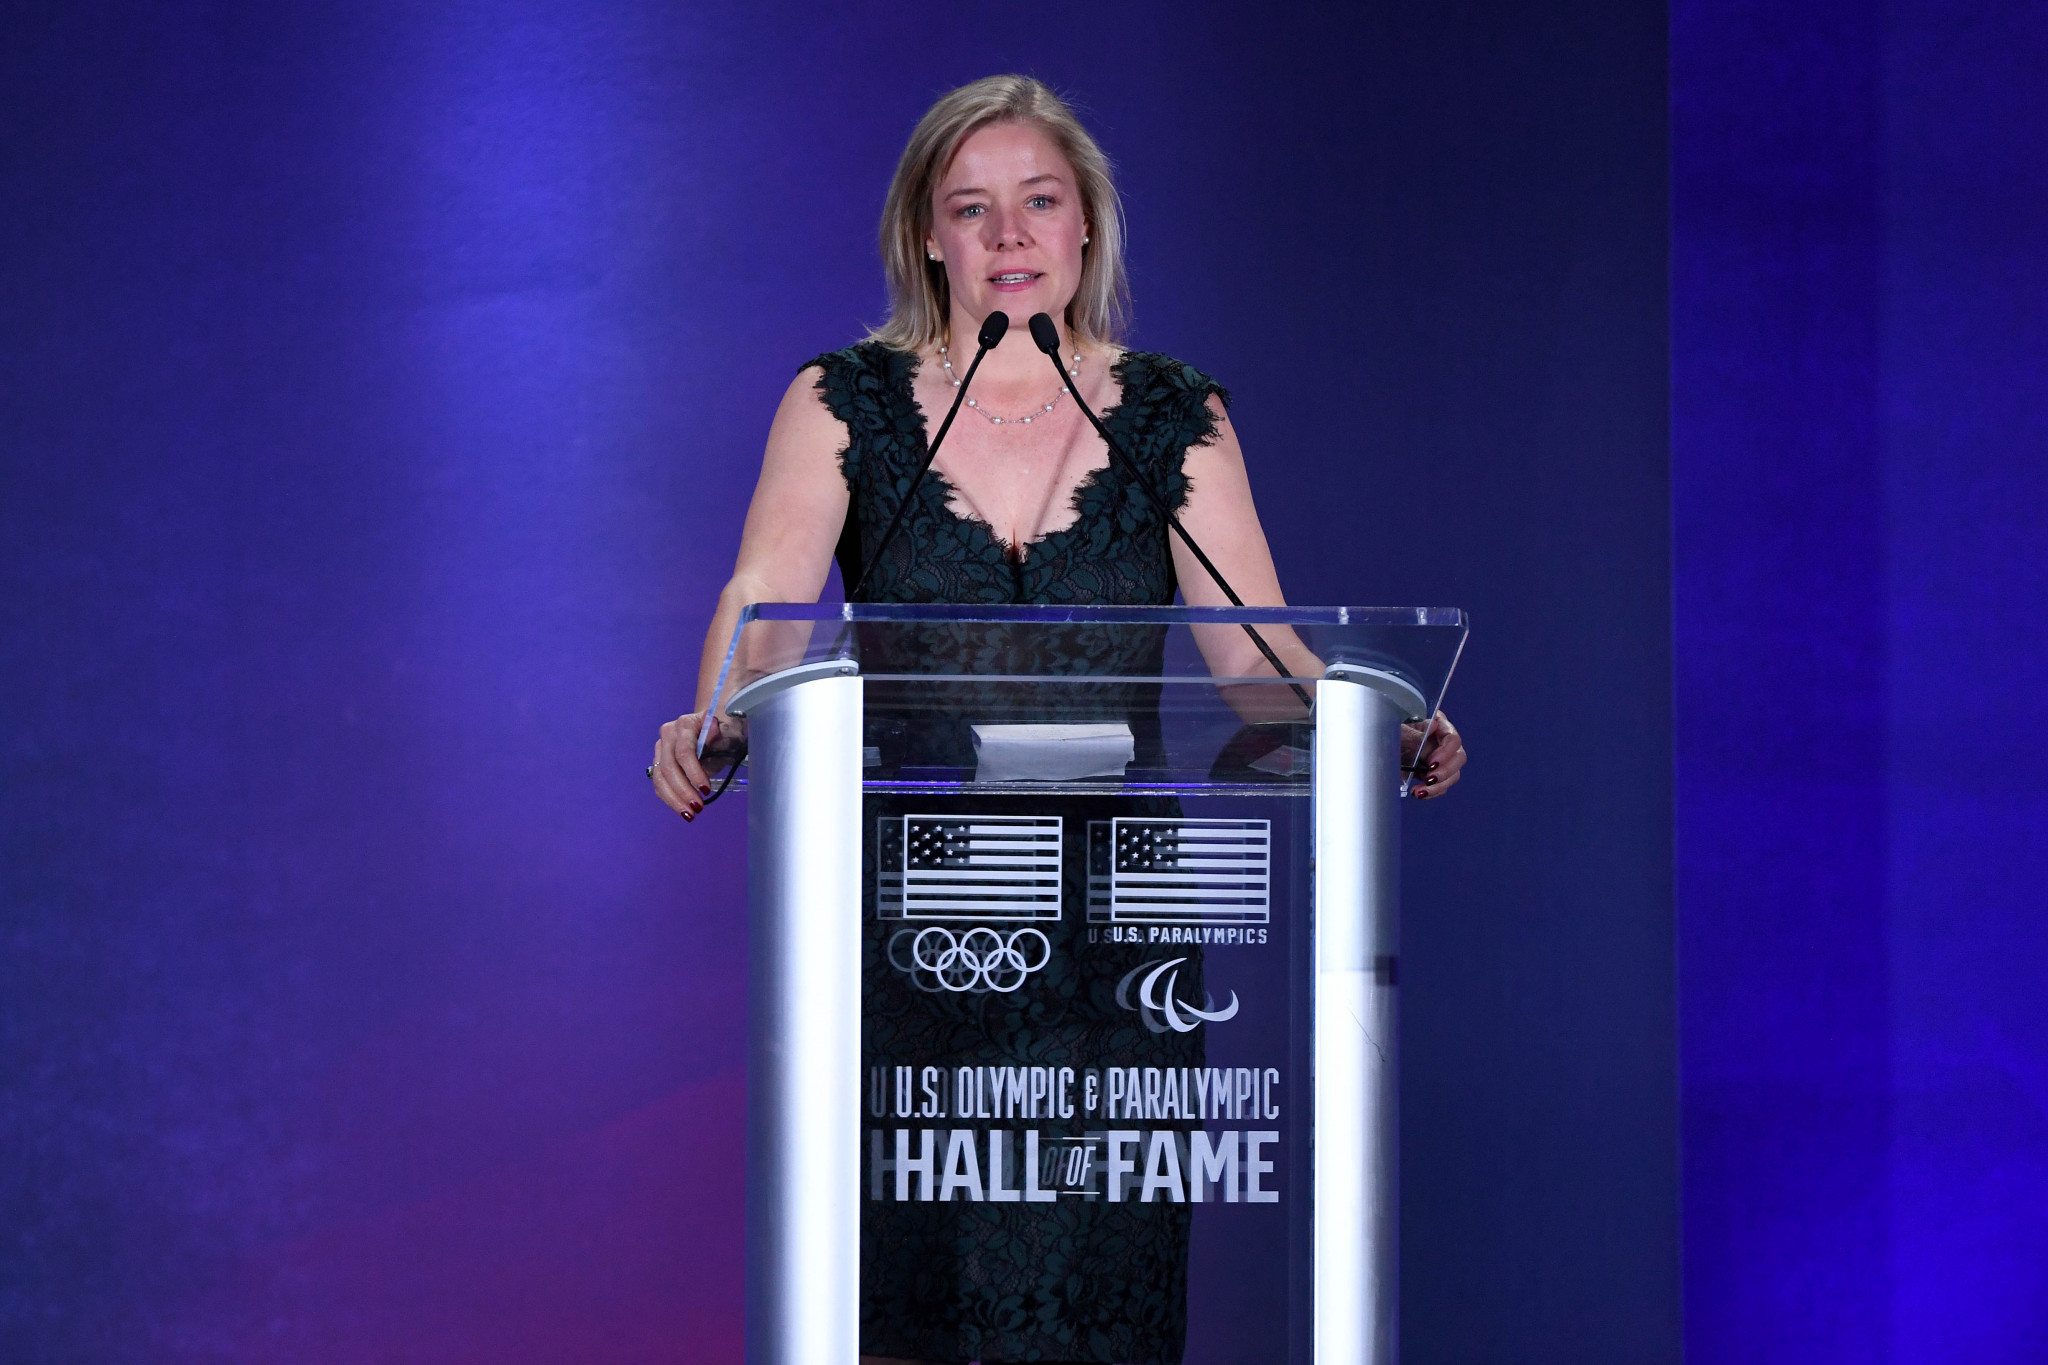 USOPC chief executive Sarah Hirshland said the organisation was